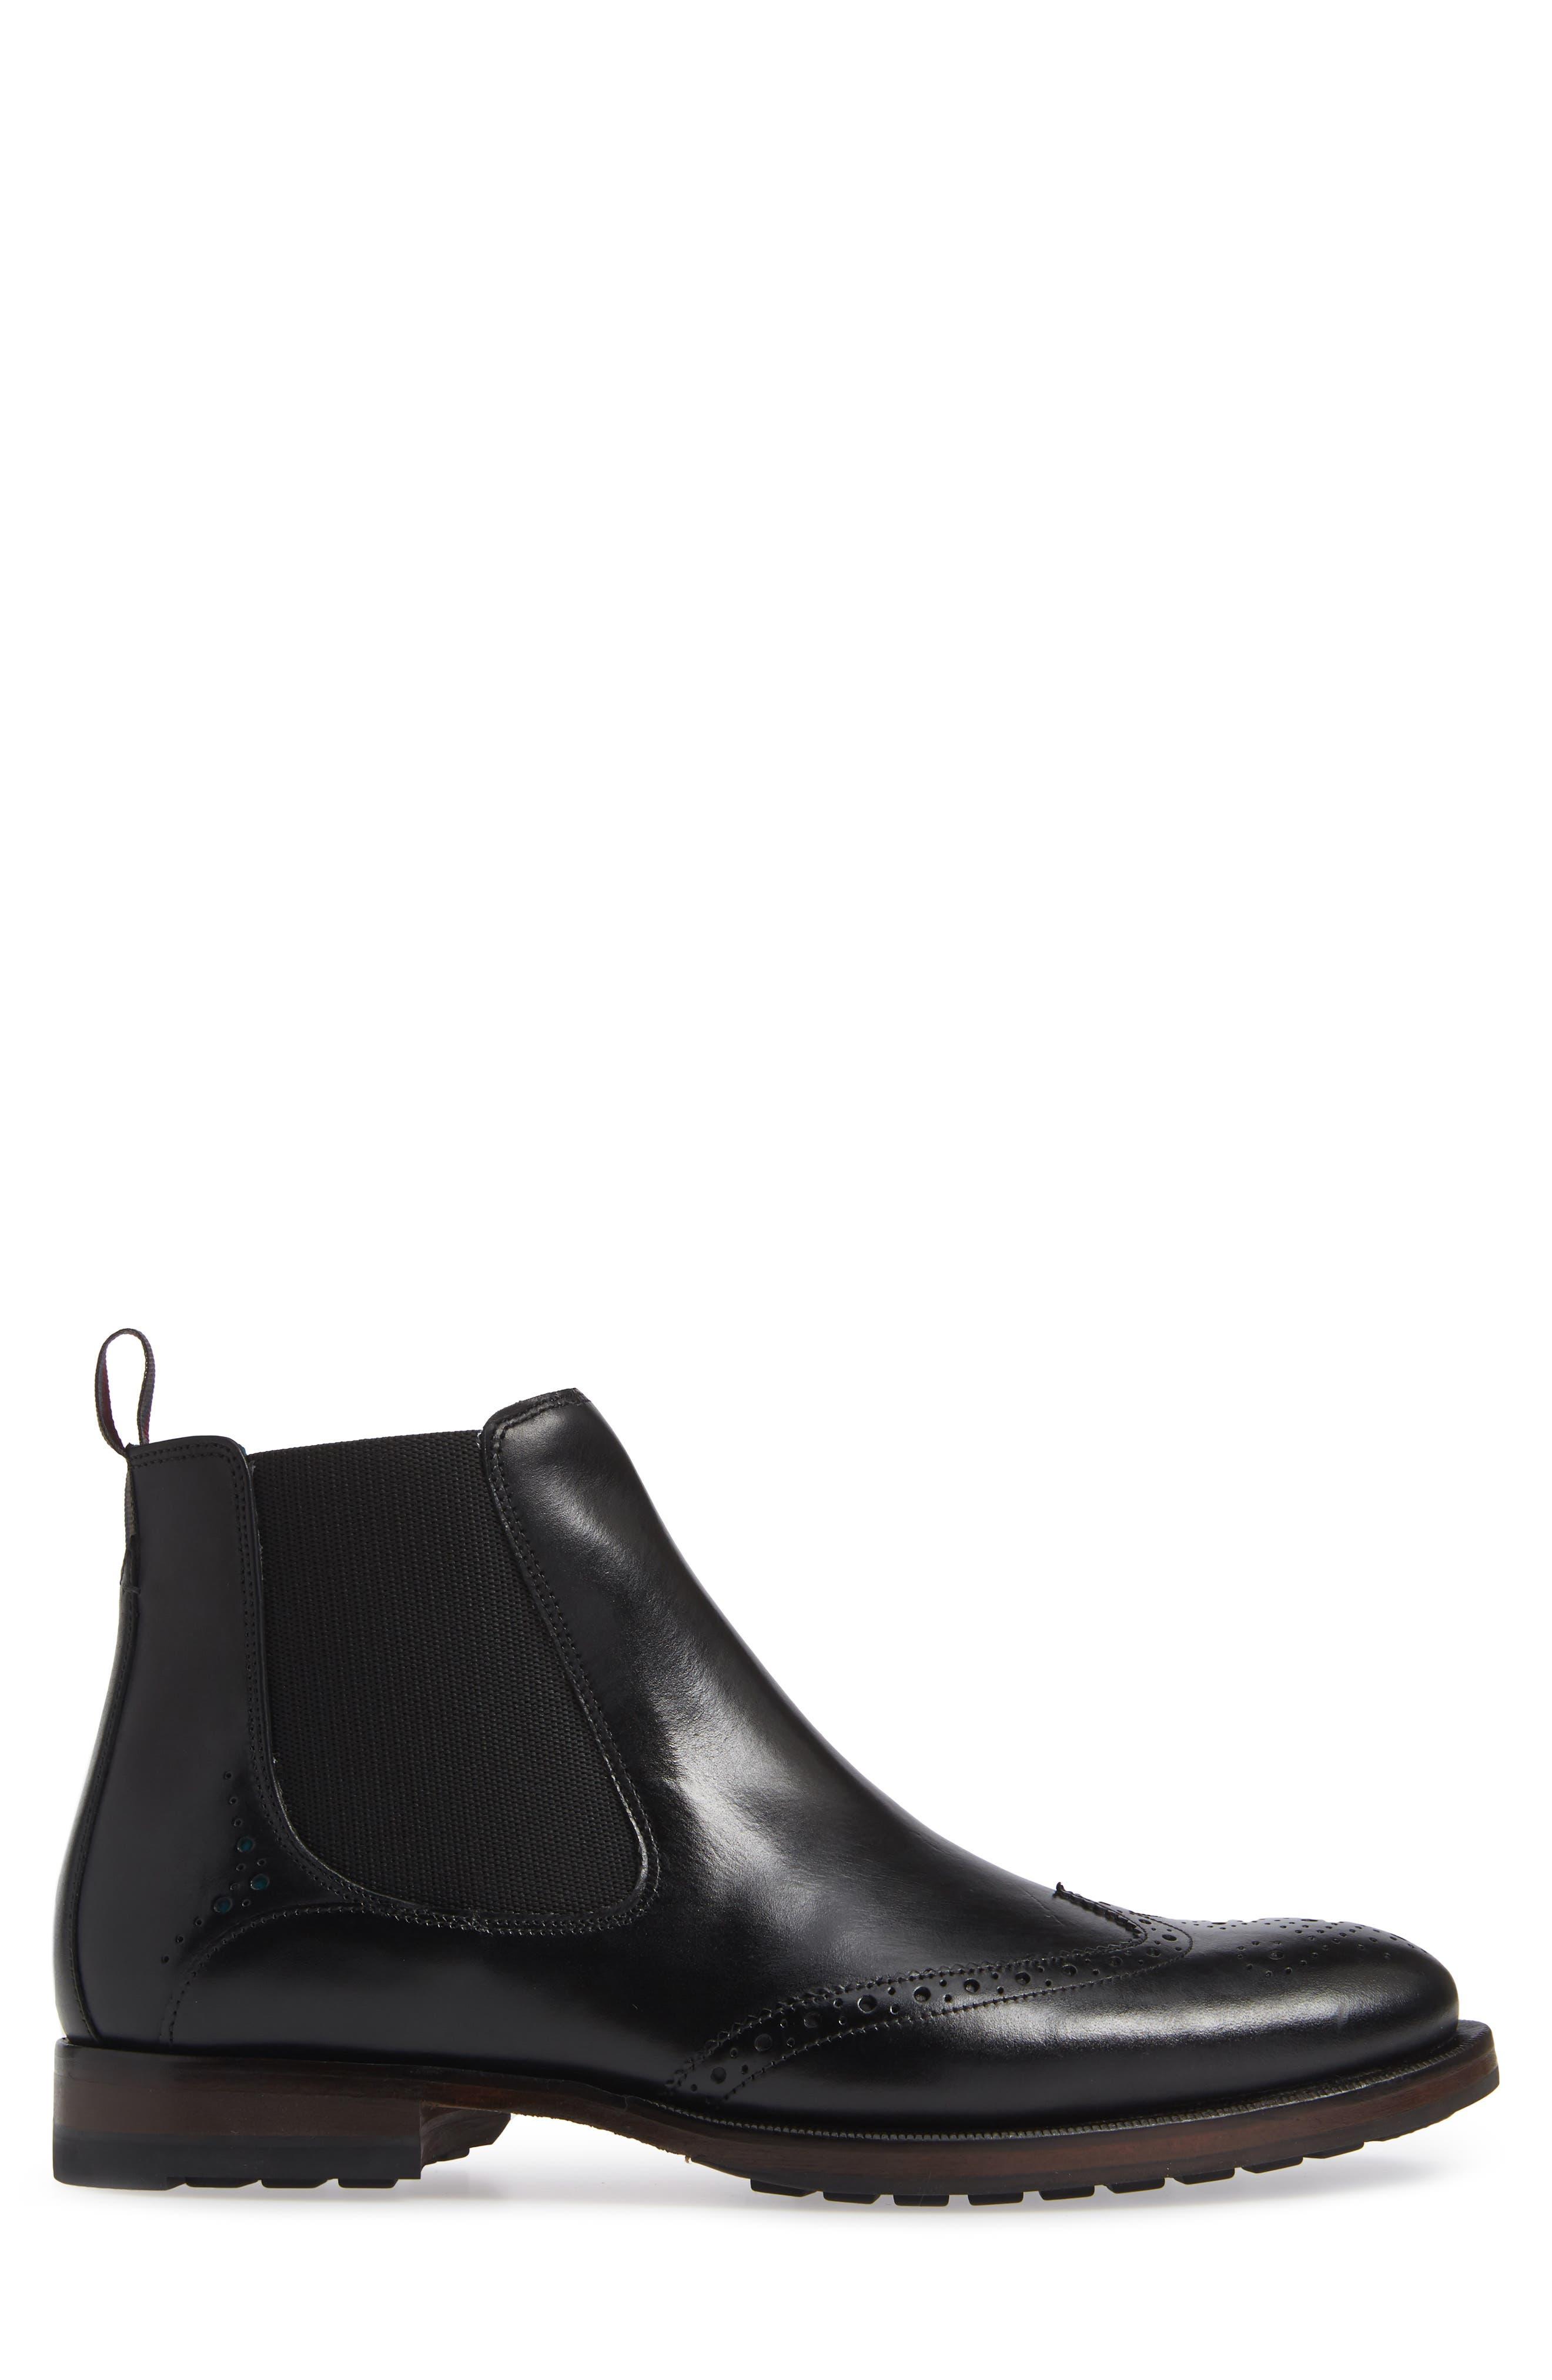 Camheri Wingtip Chelsea Boot,                             Alternate thumbnail 3, color,                             BLACK LEATHER